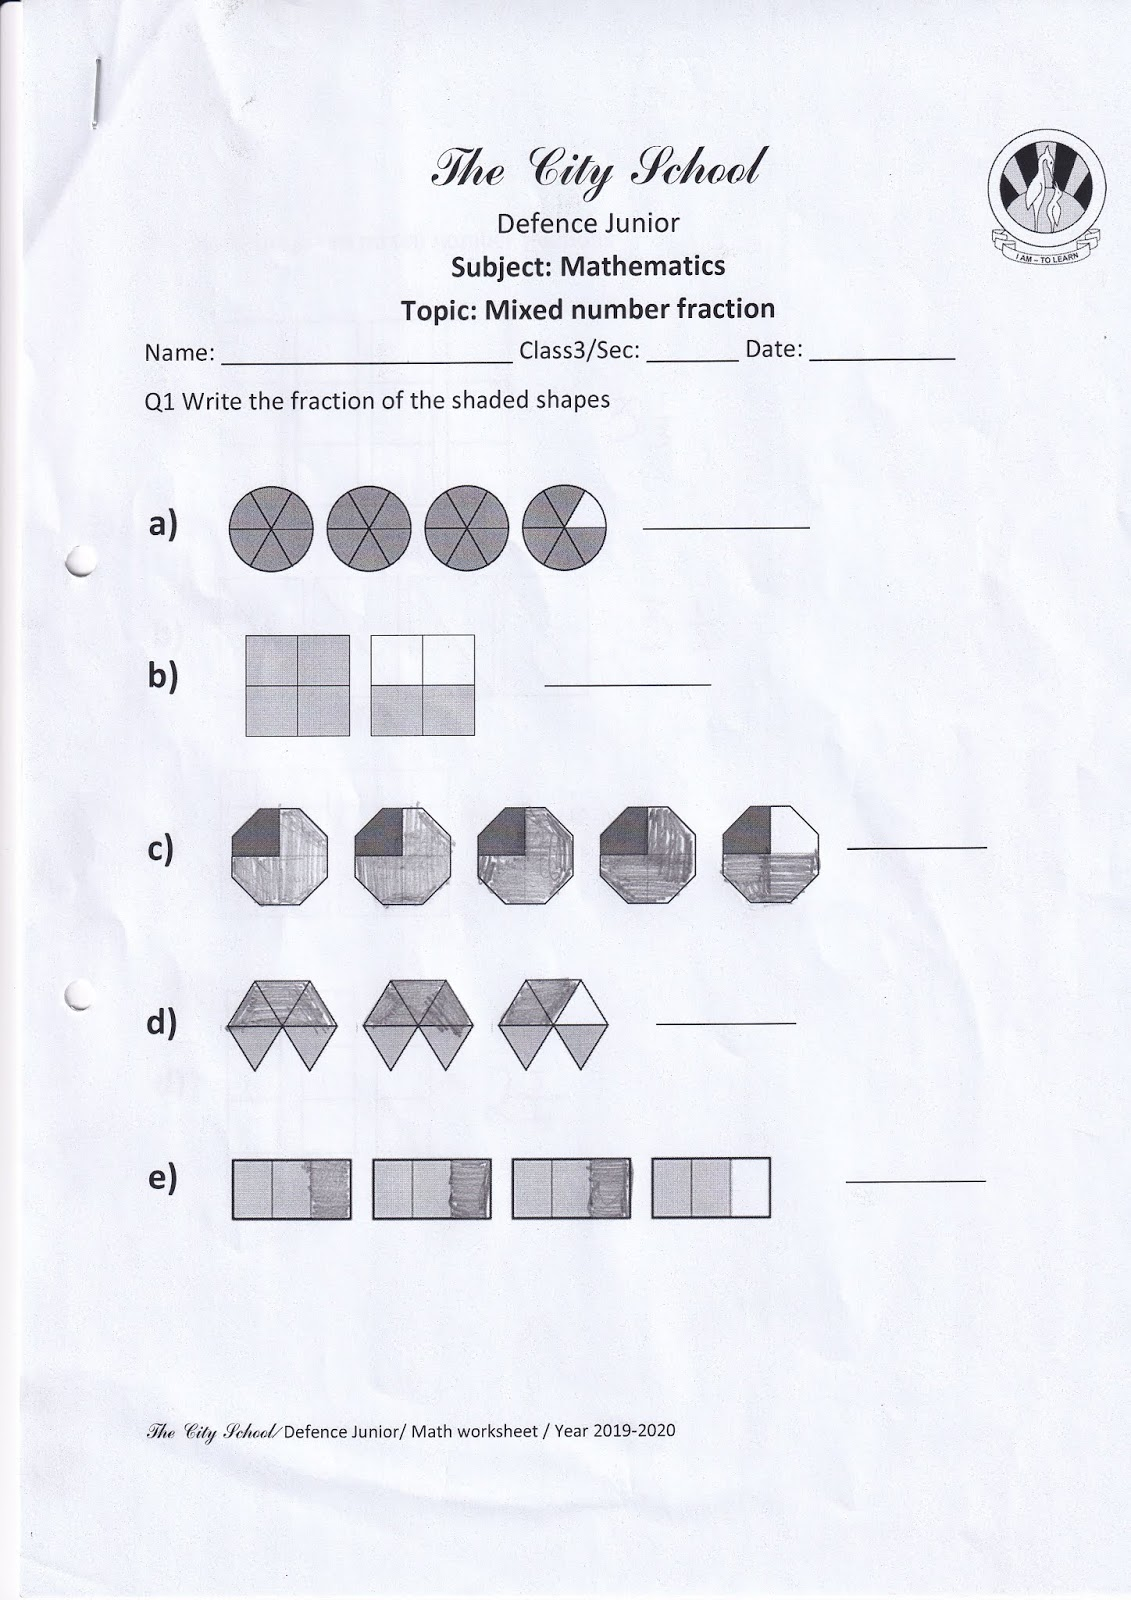 The City School Defence Junior Mathematics Worksheet